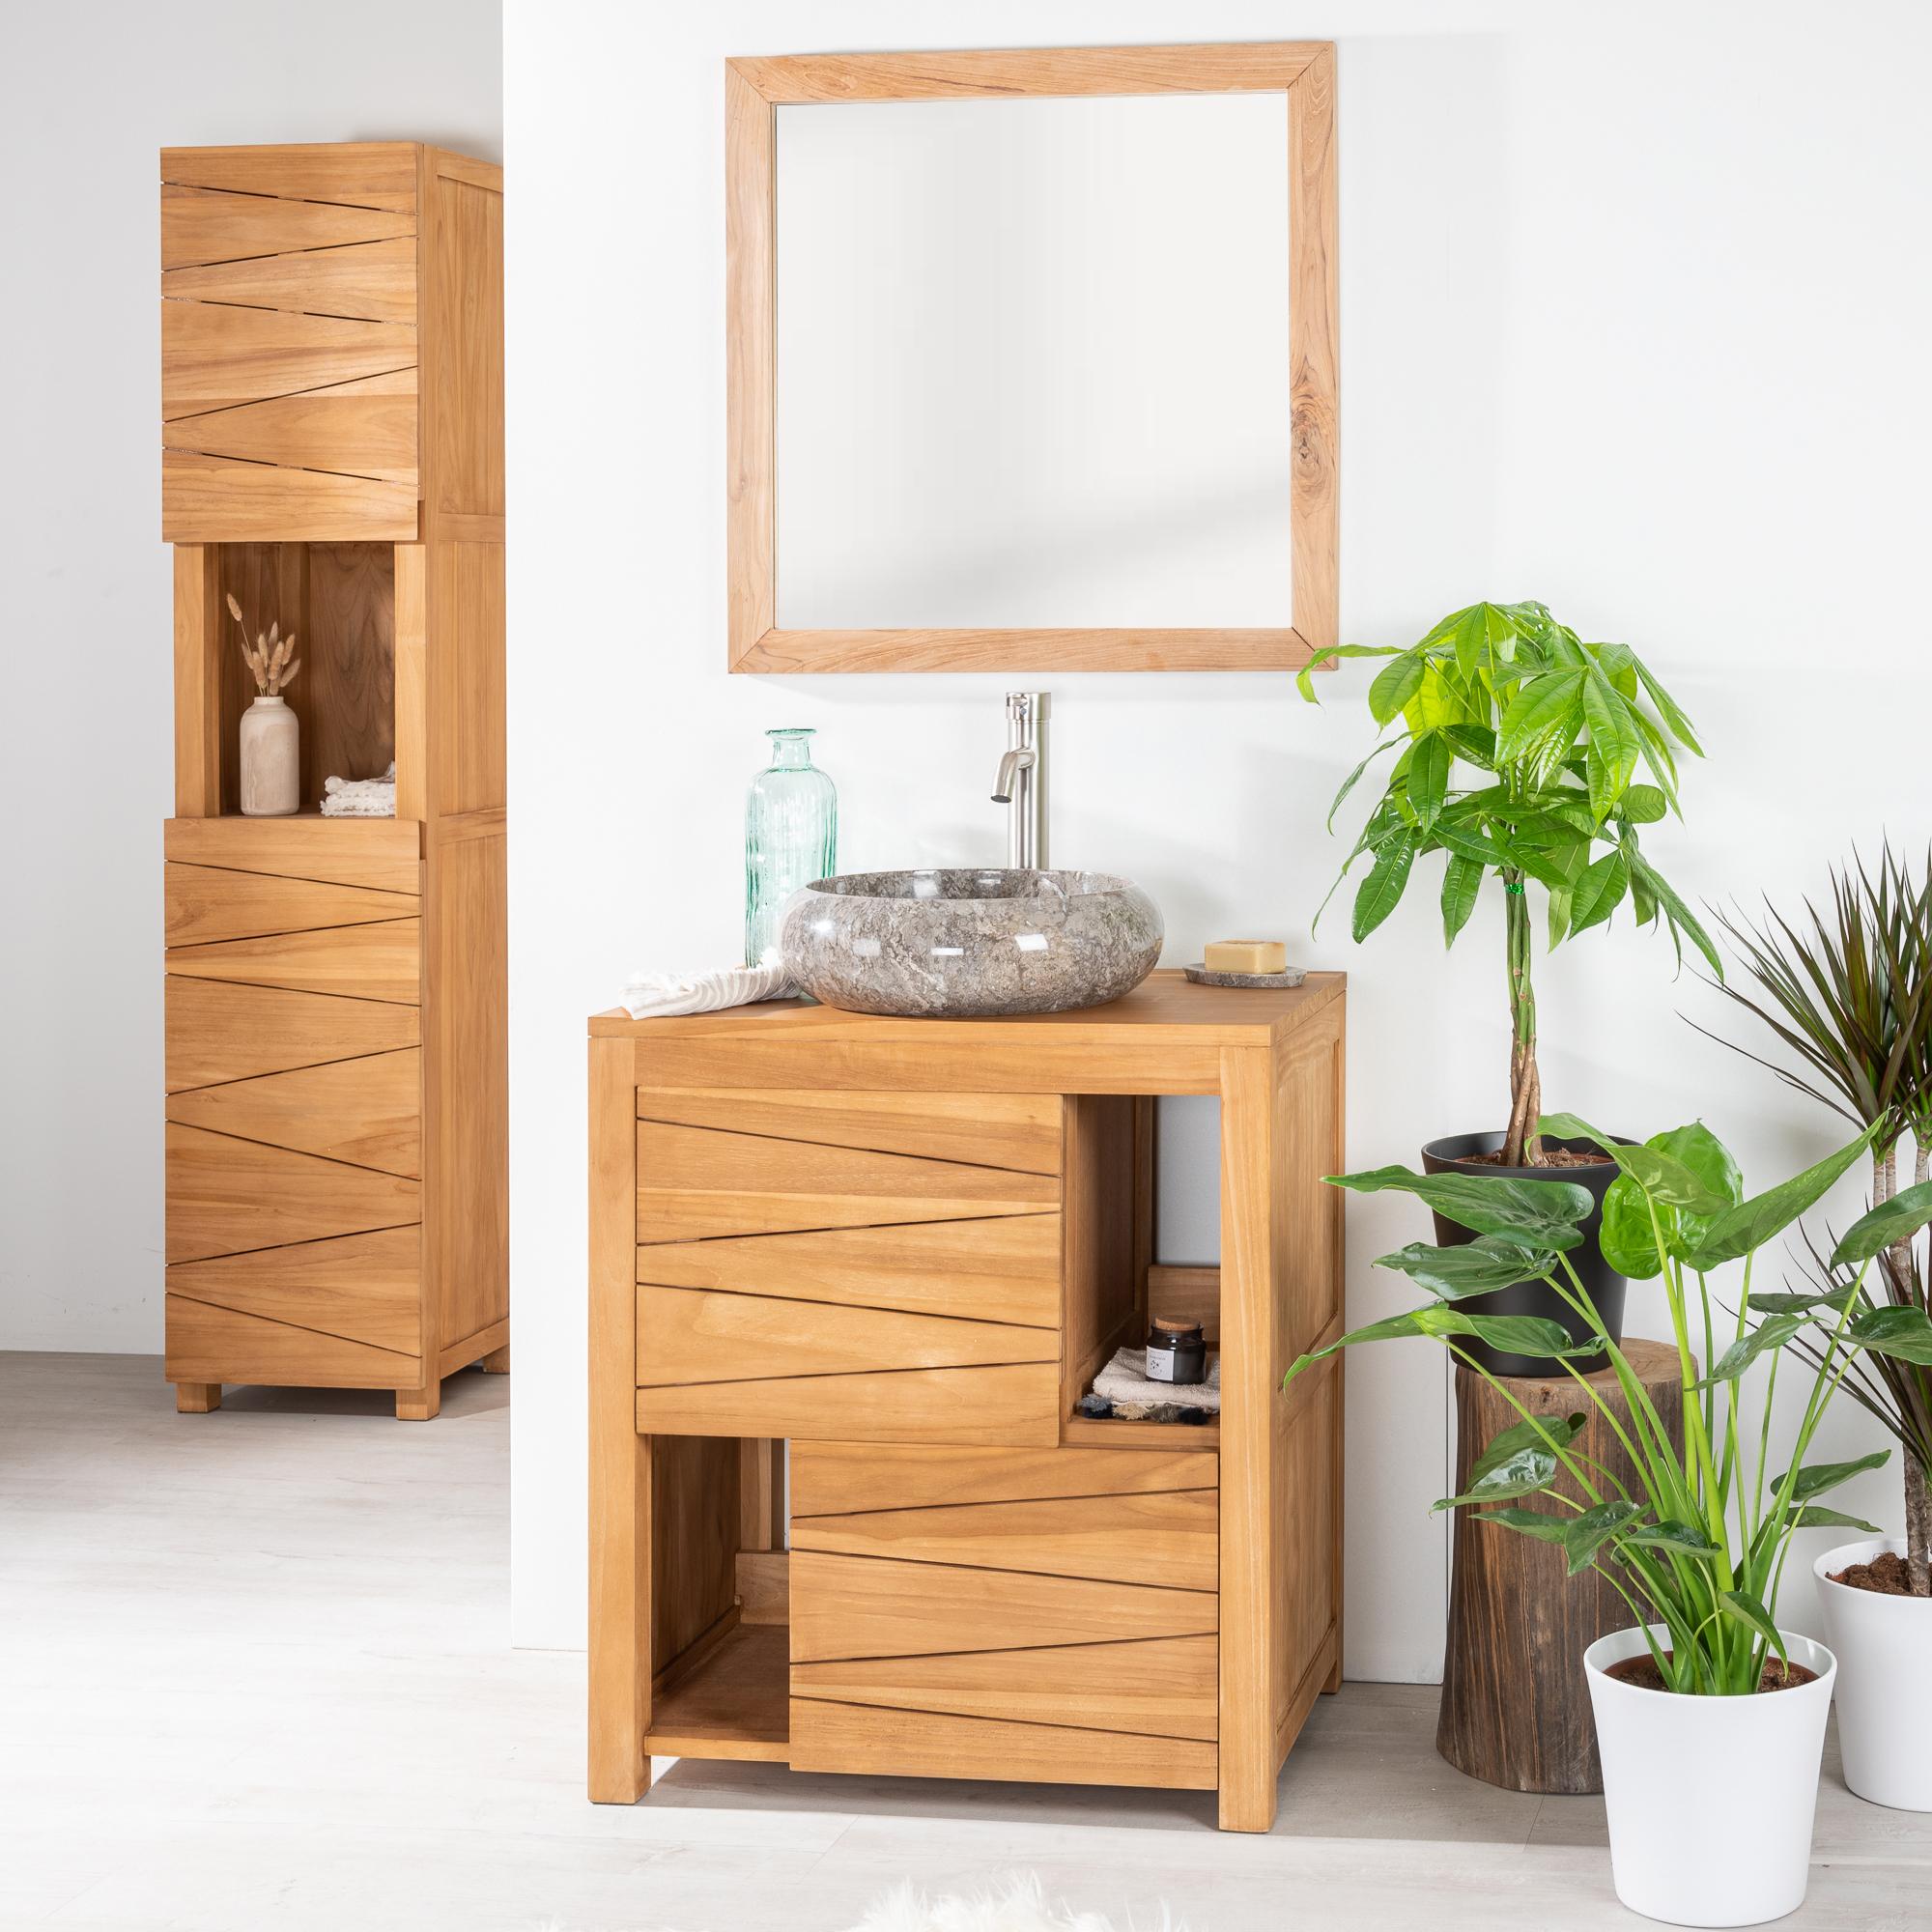 Mueble para lavabo mueble para lavabo teca cosy 70 cm for Muebles de lavabo de 70 cm